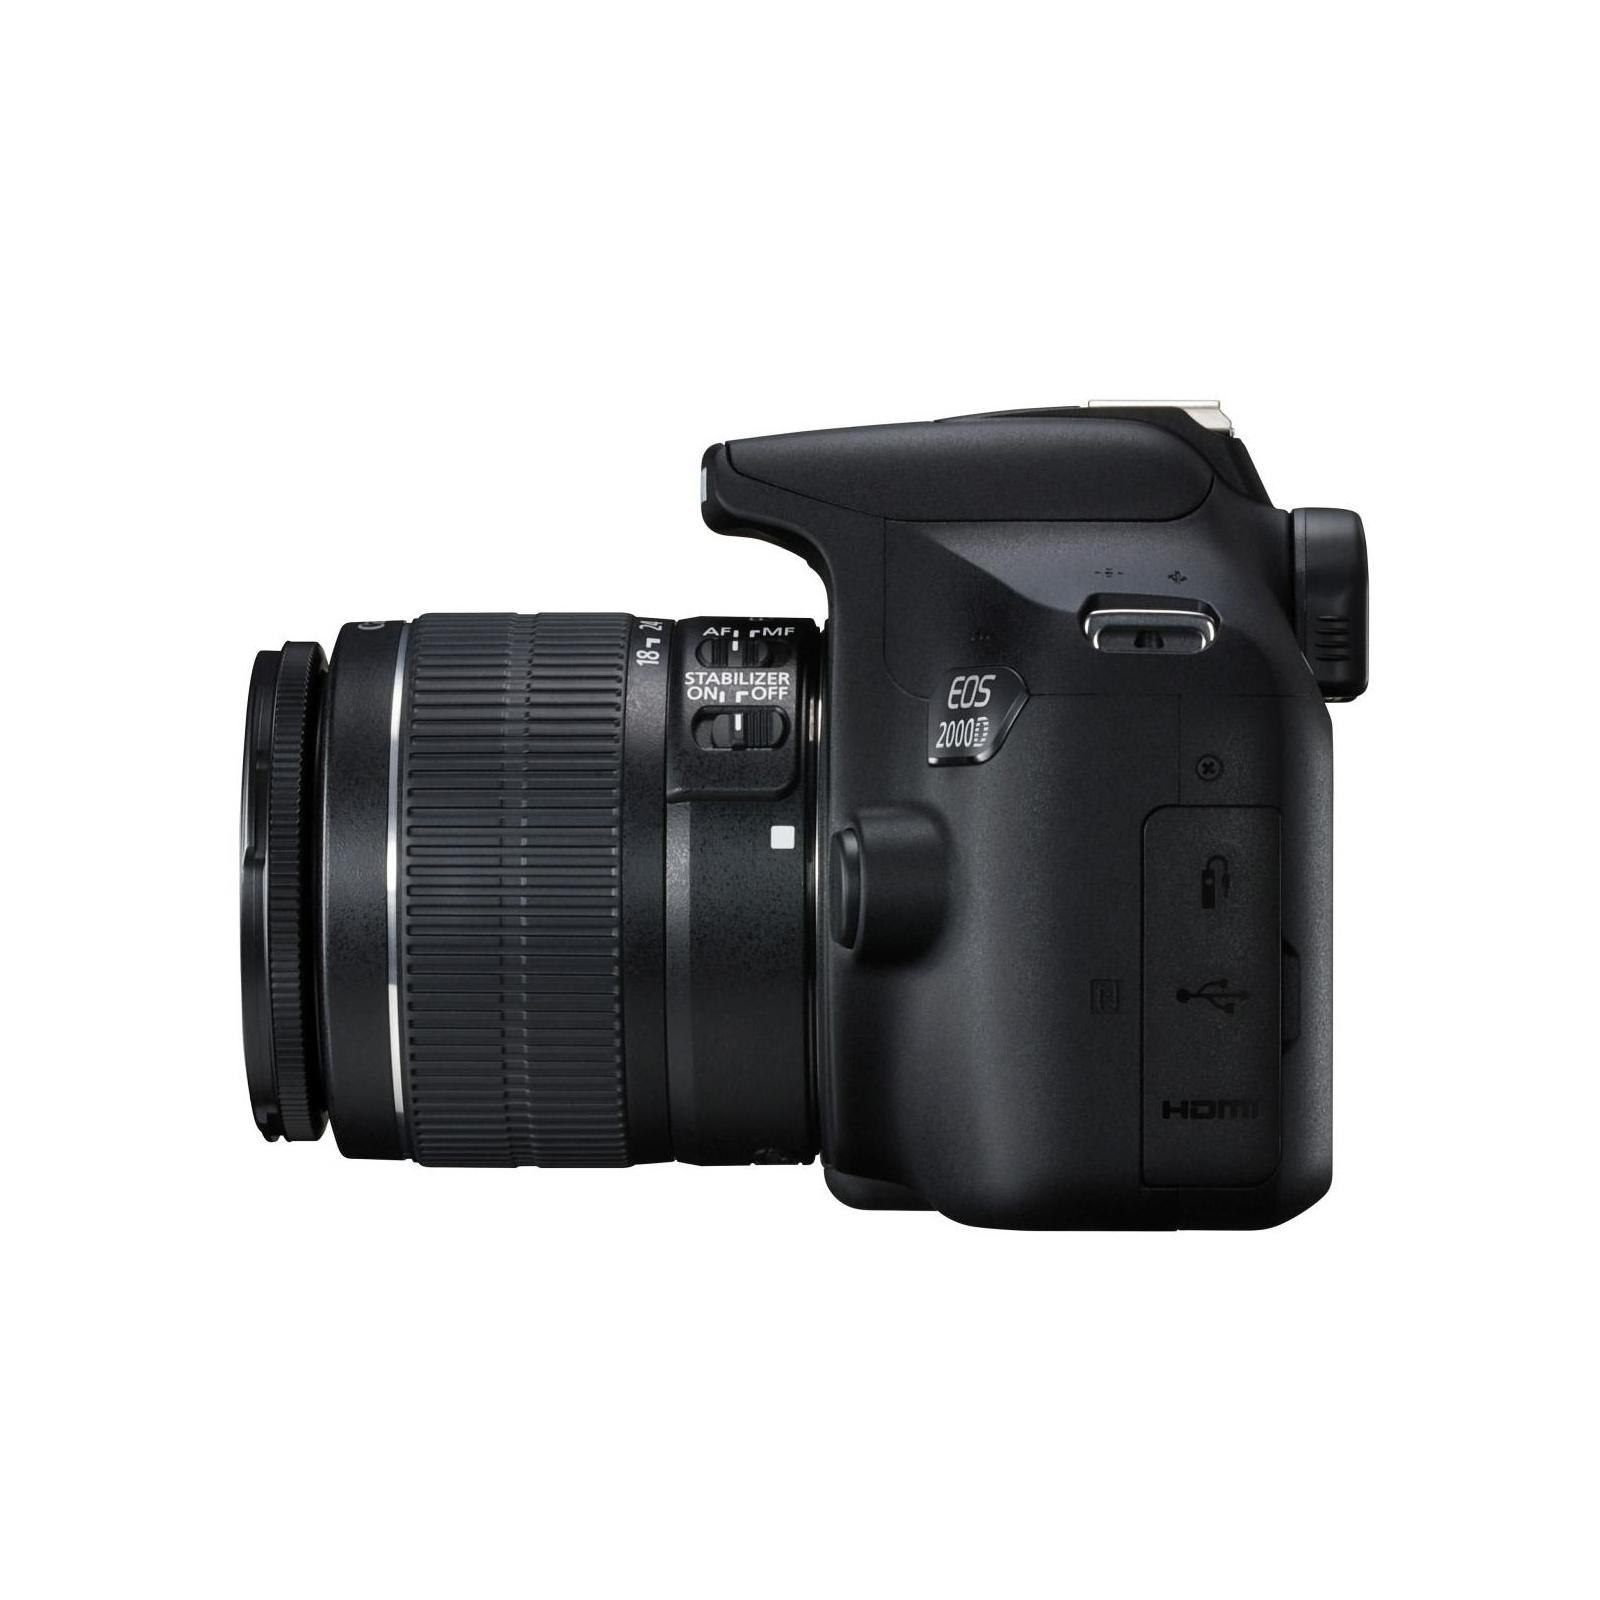 Цифровой фотоаппарат Canon EOS 2000D 18-55 IS II kit (2728C008) изображение 5